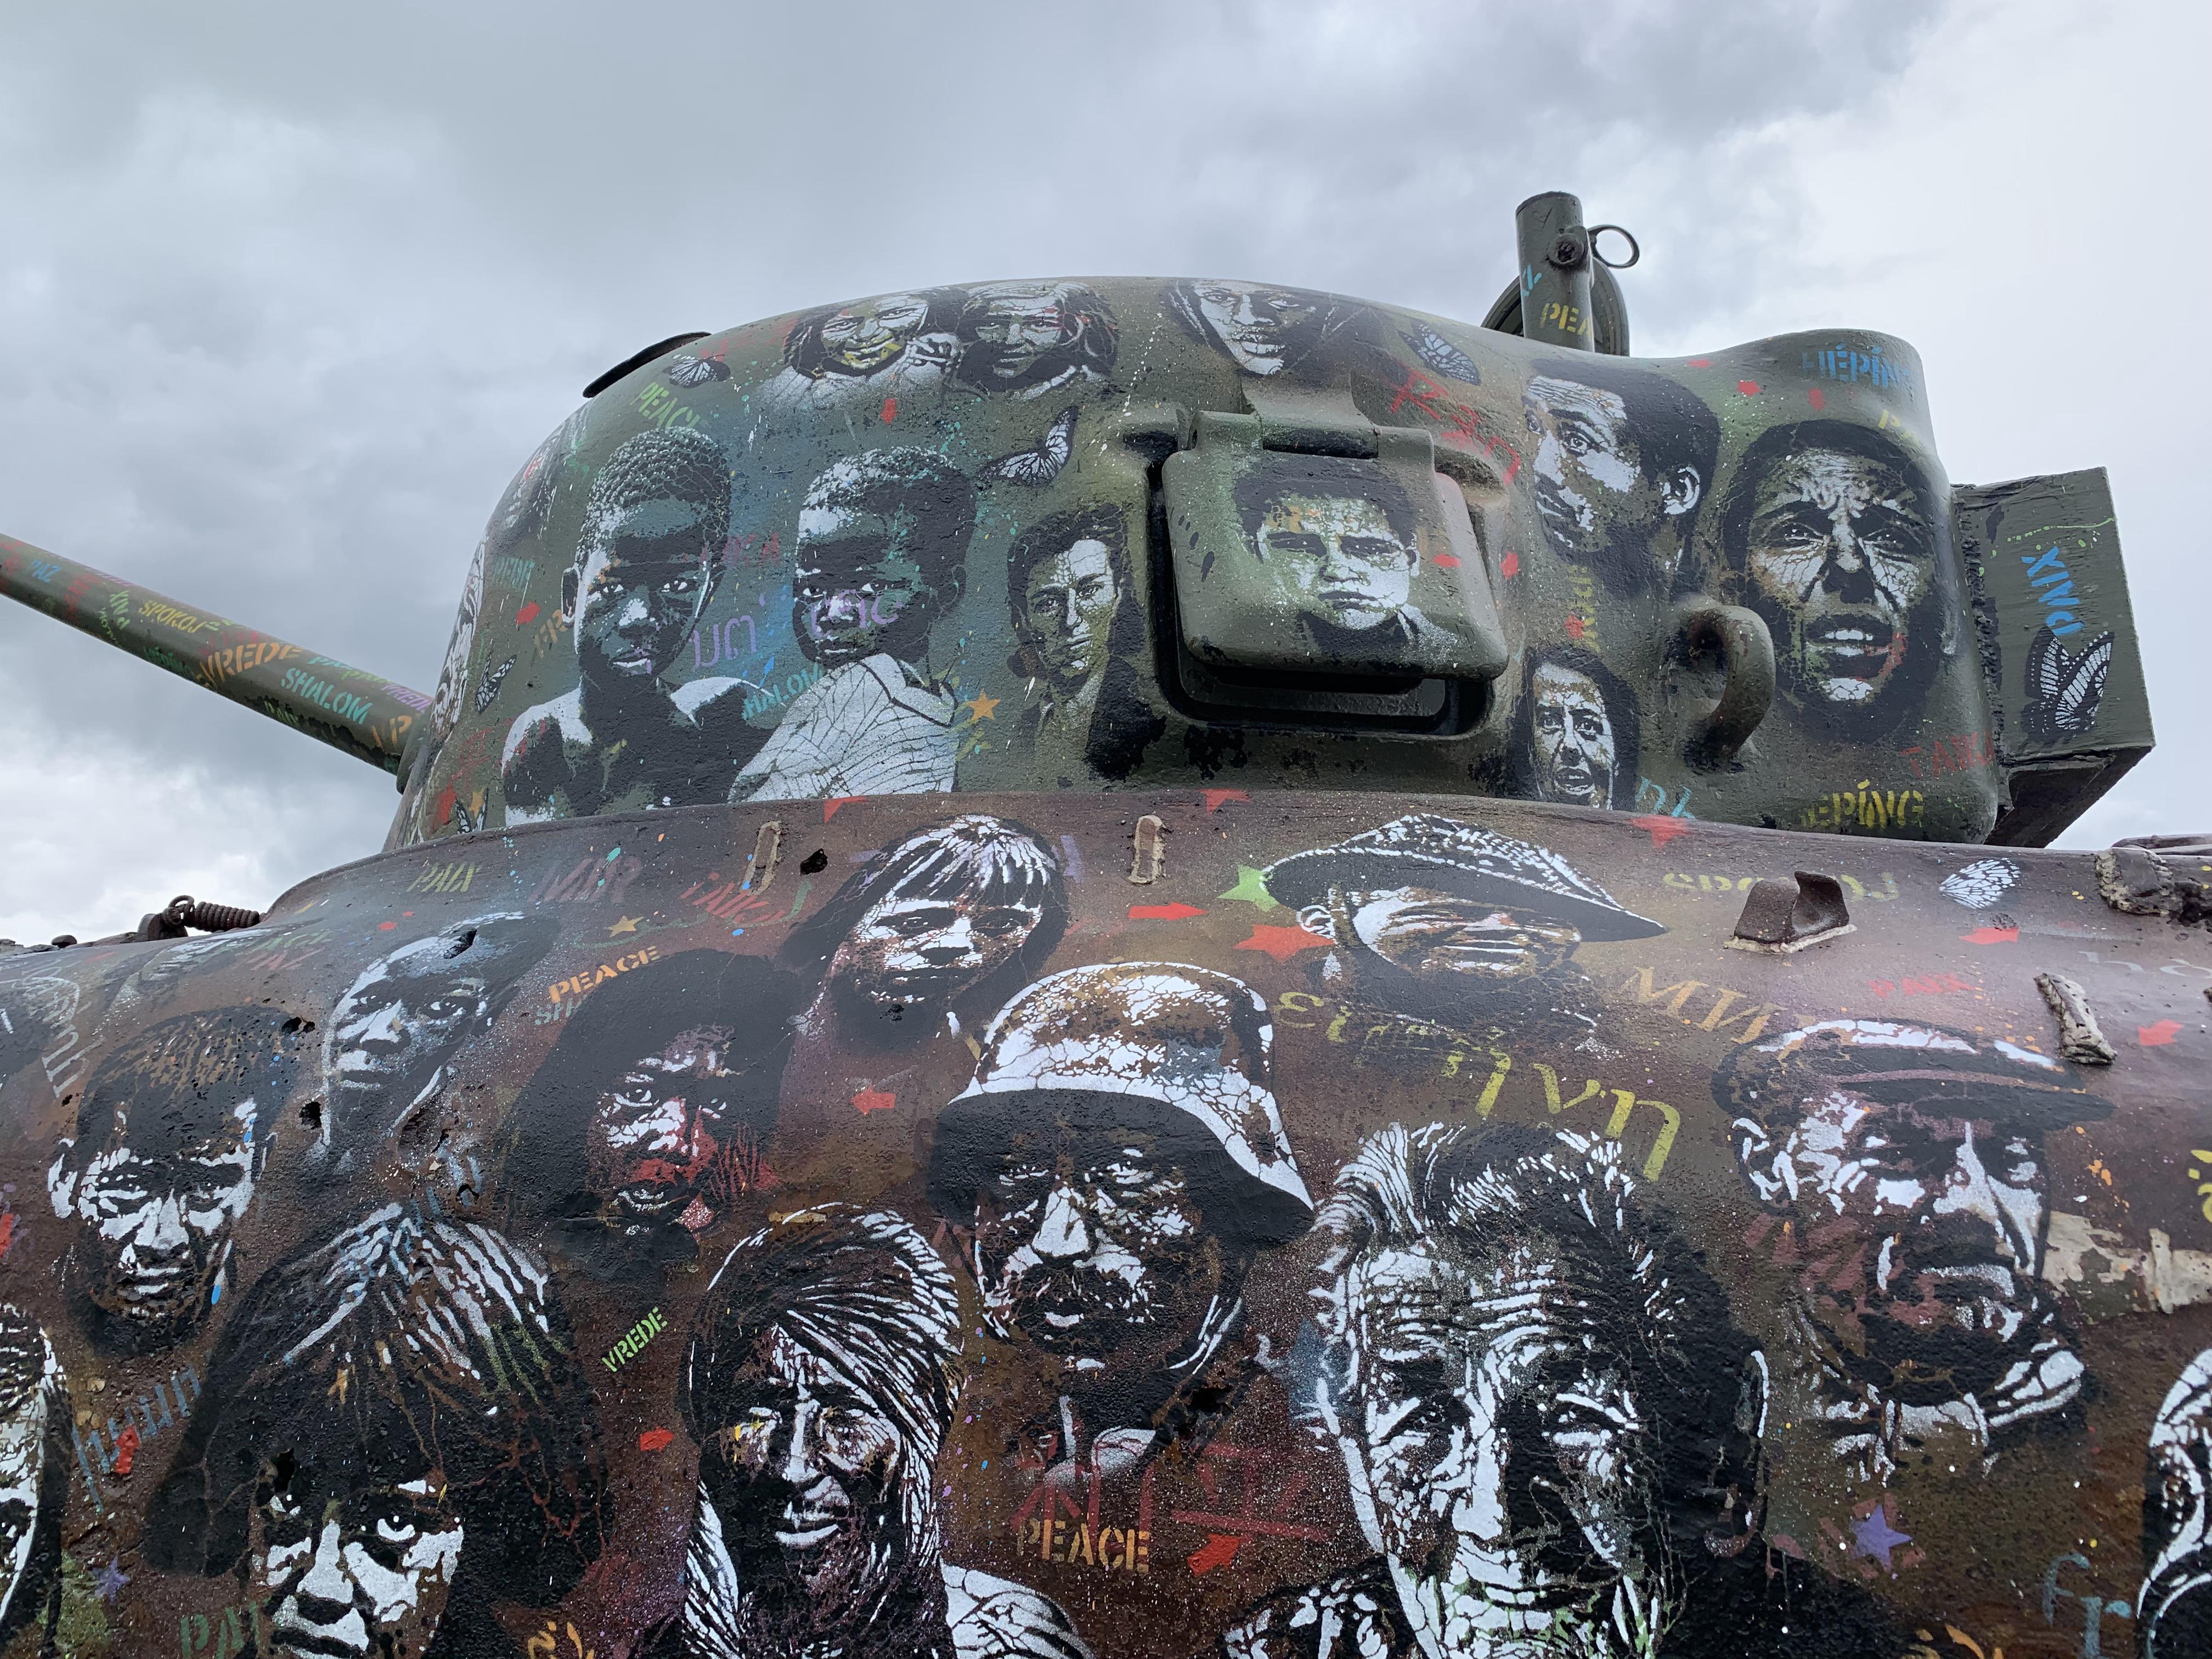 Street art tank